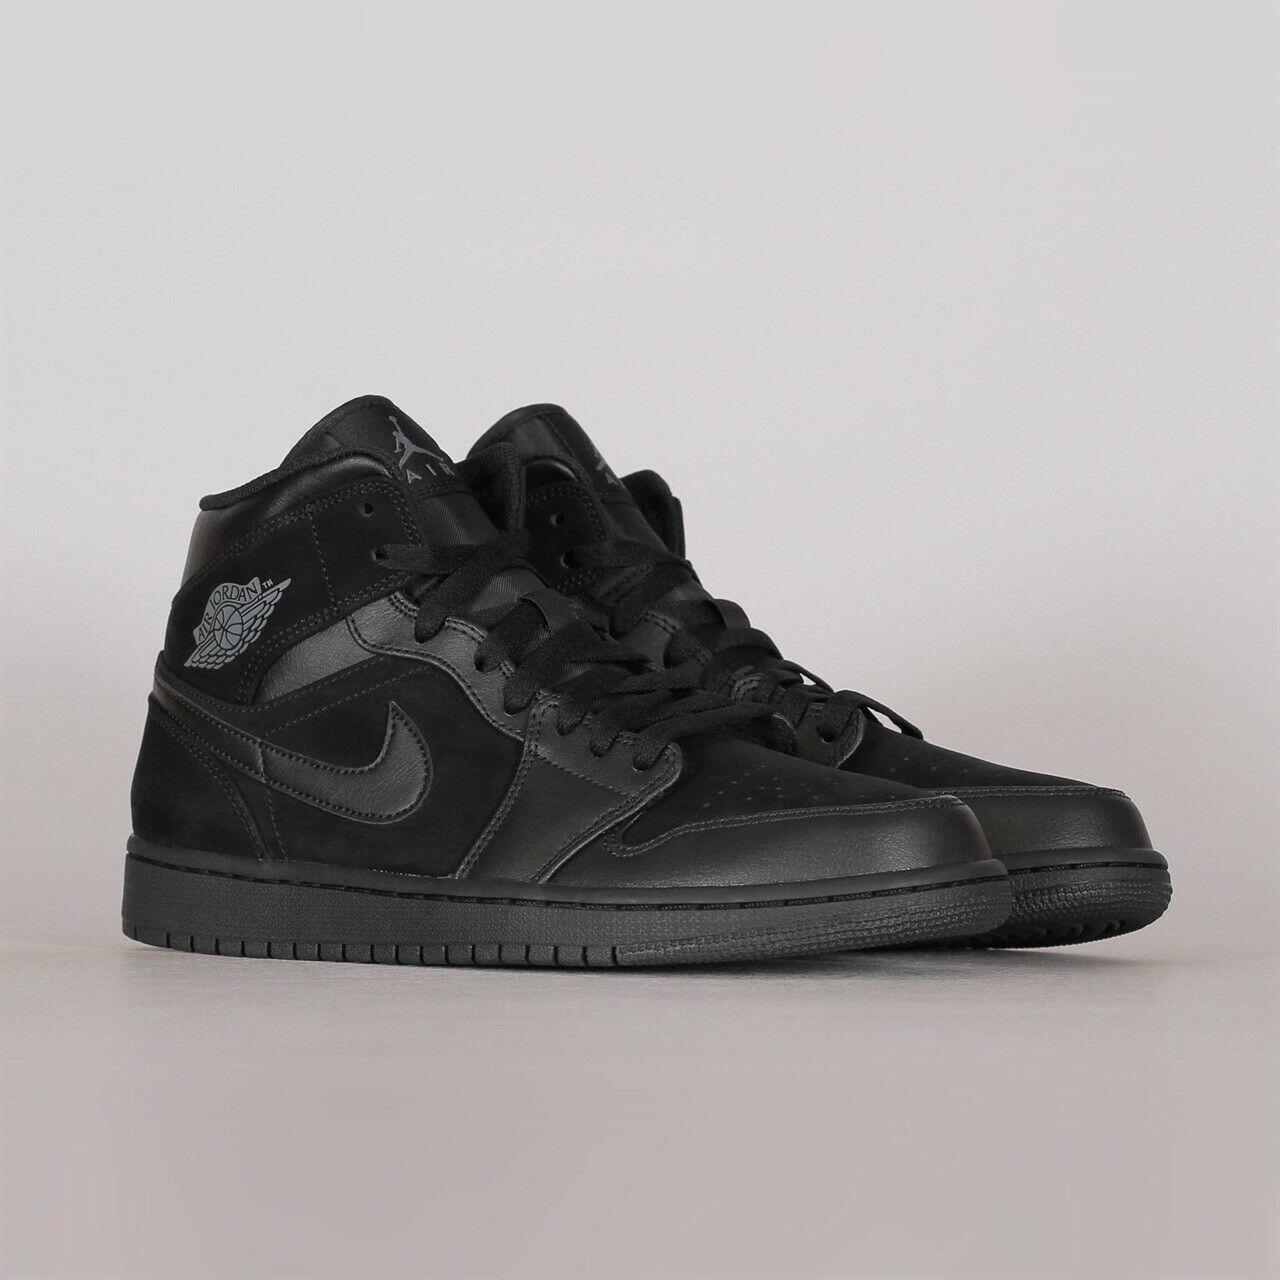 Jordan 1 Mid Triple Black 2018